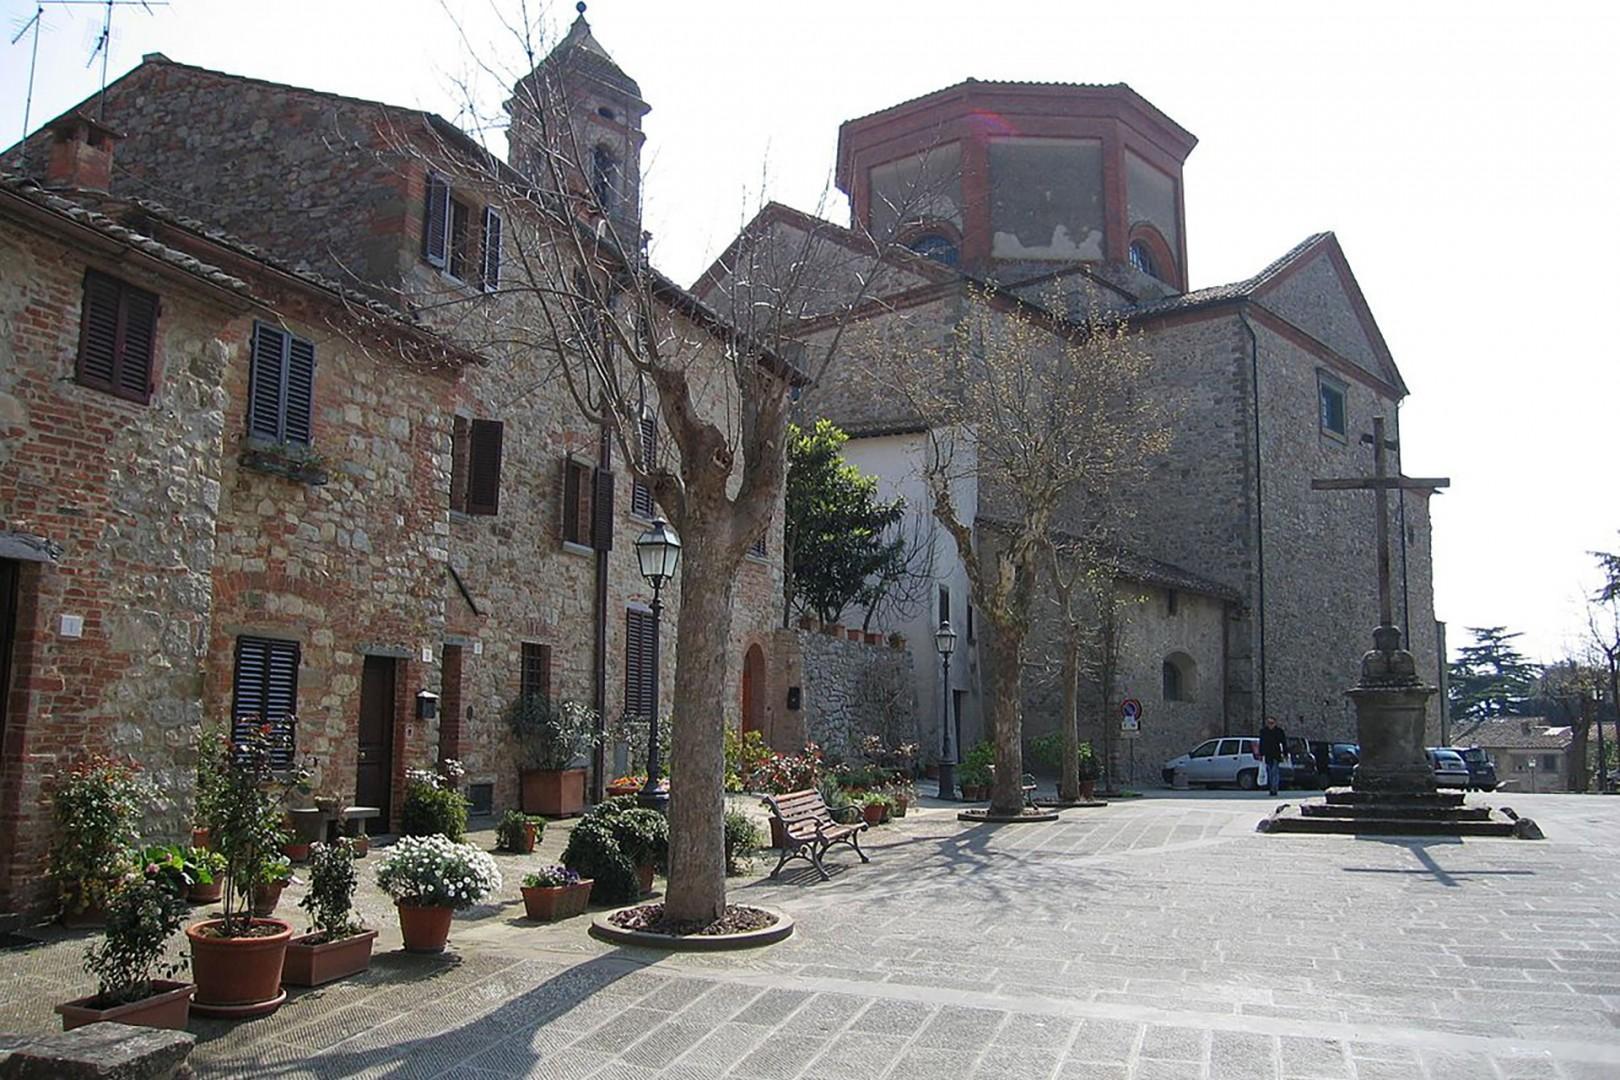 Lucignano's beautiful central piazza.